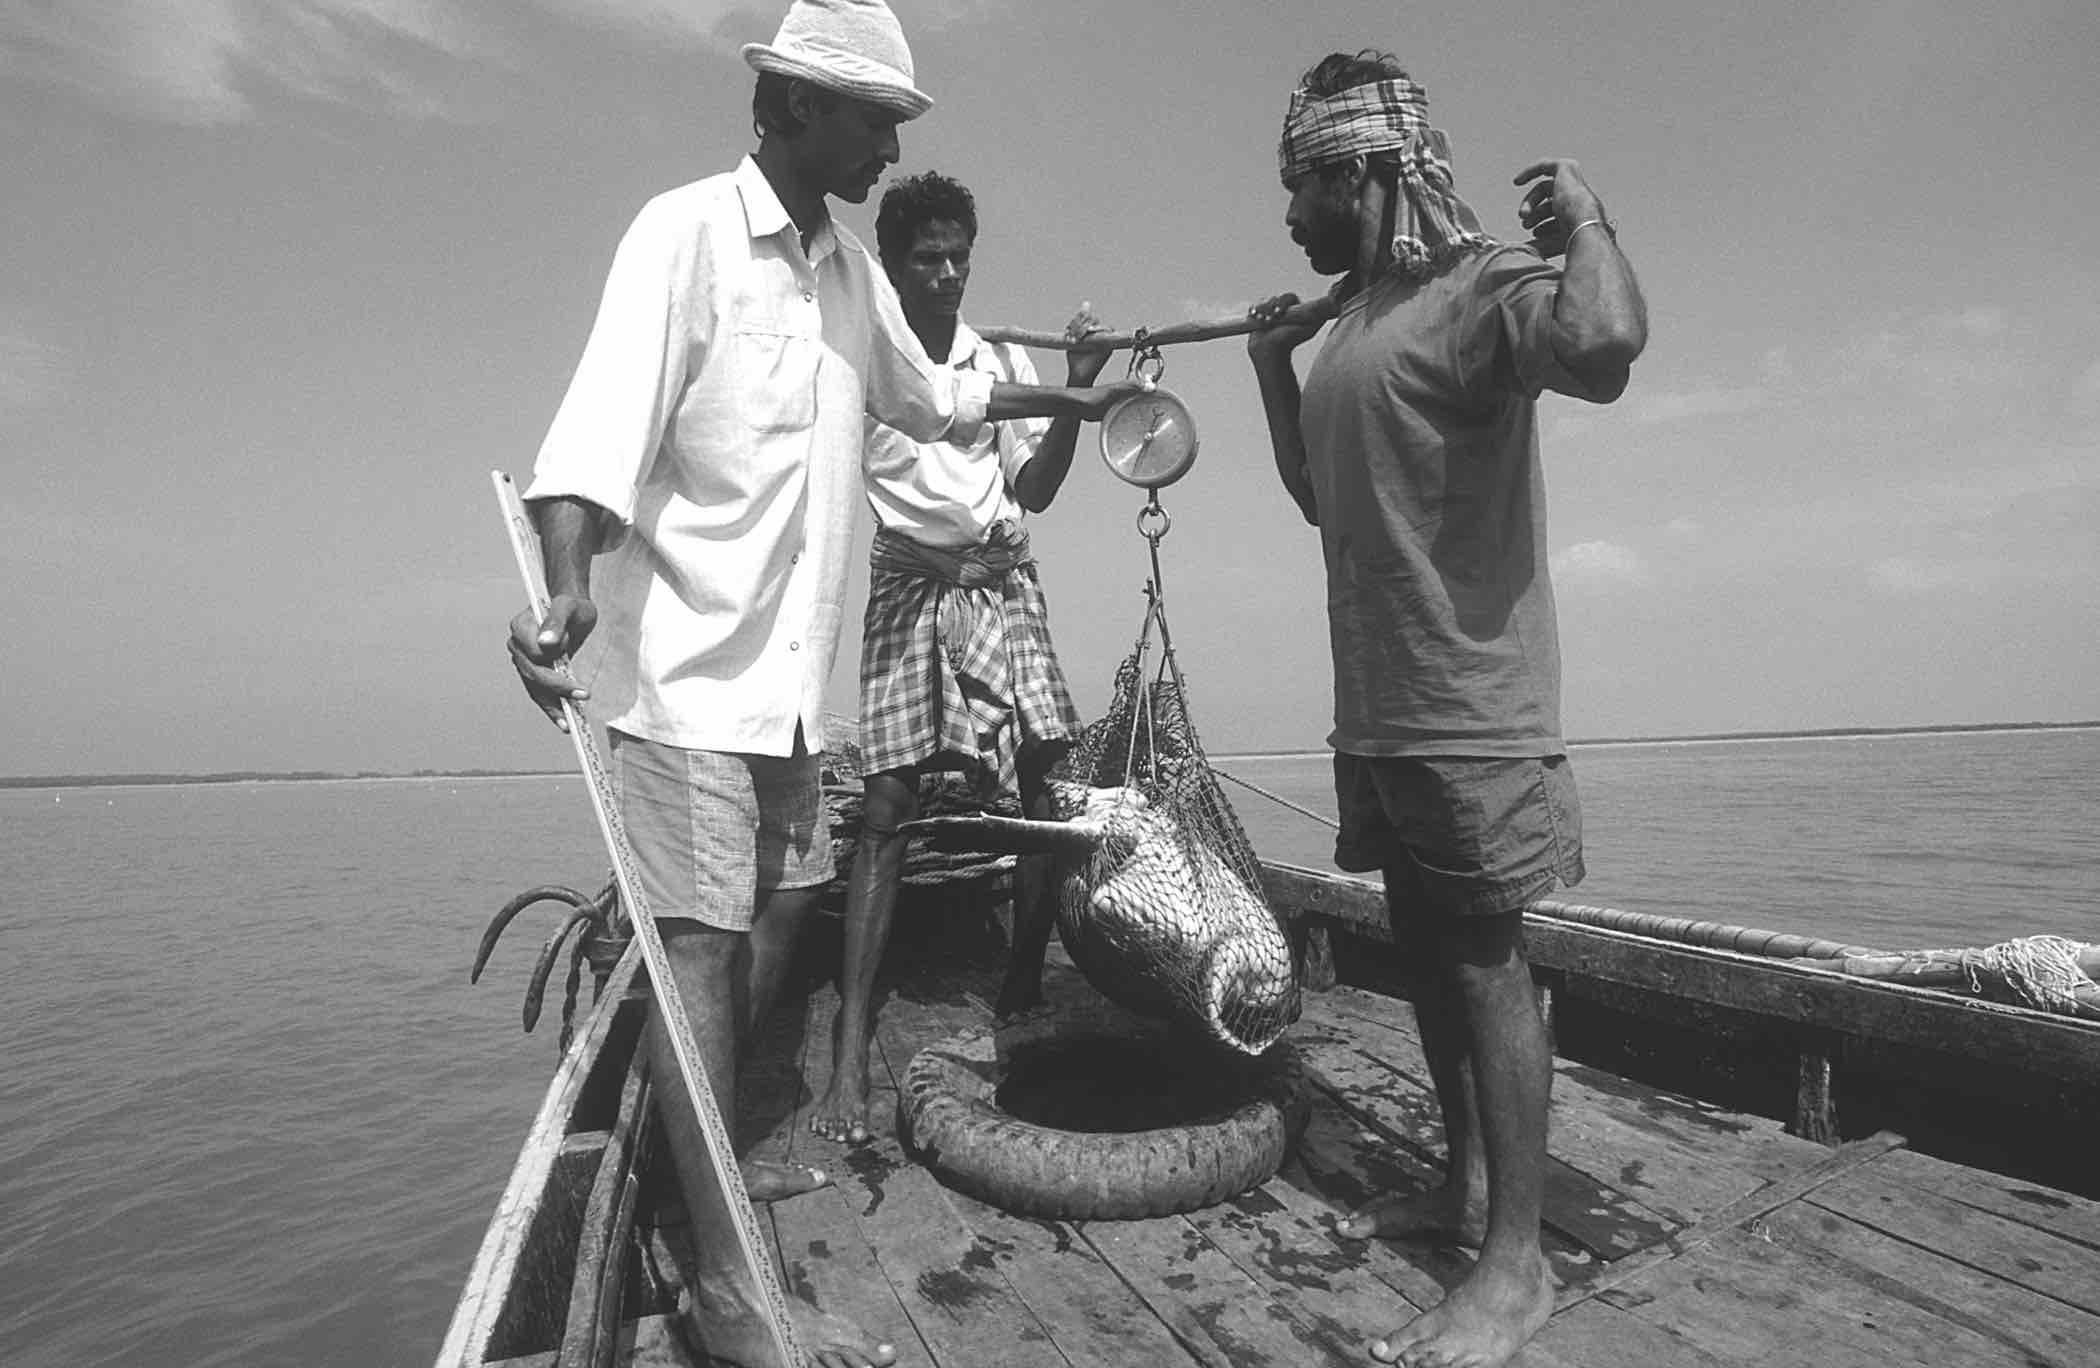 A field team weighs an olive ridley in Gahirmatha, state of Orissa, India. © Bivash Pandav